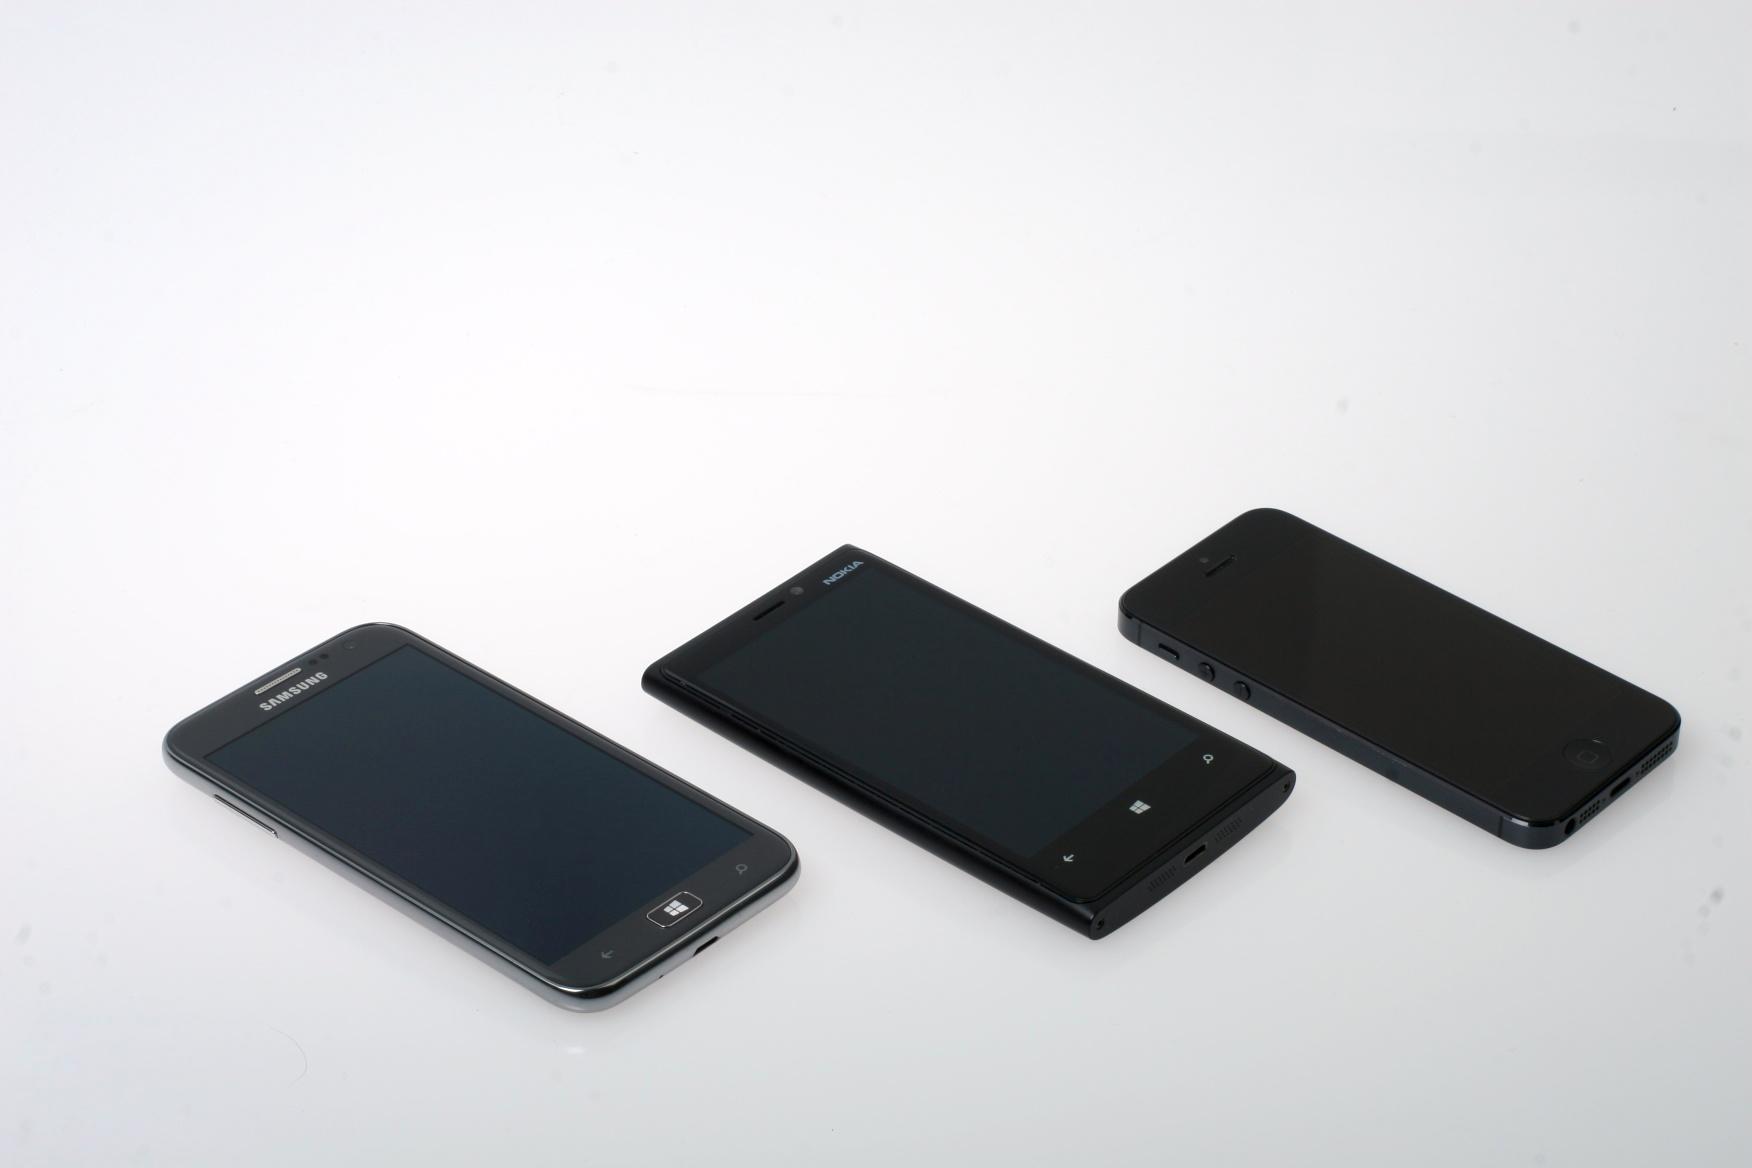 Fra venstre: Samsung Ativ S, Nokia Lumia 920 og Apple iPhone 5.Foto: Kurt Lekanger, Amobil.no